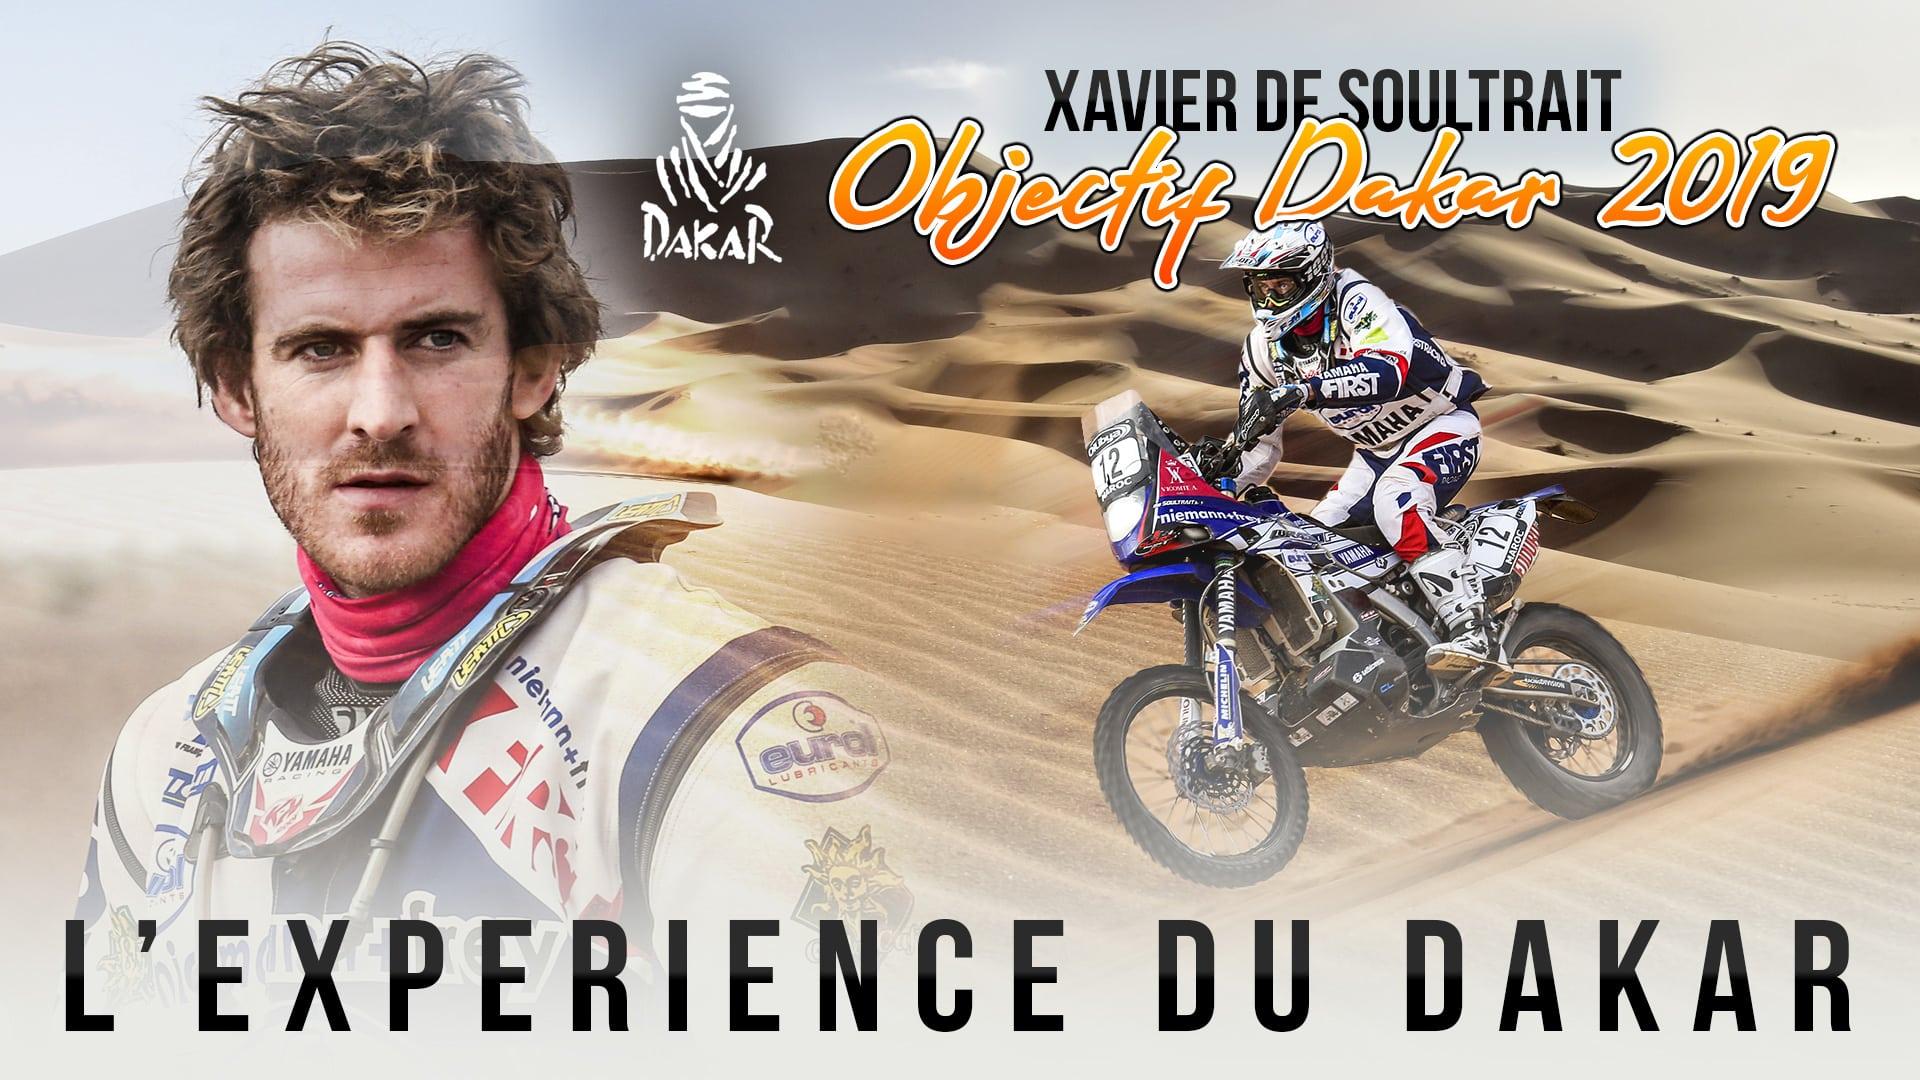 Objectif Dakar épisode 6 l'expérience du Dakar avec Xavier de Soultrait